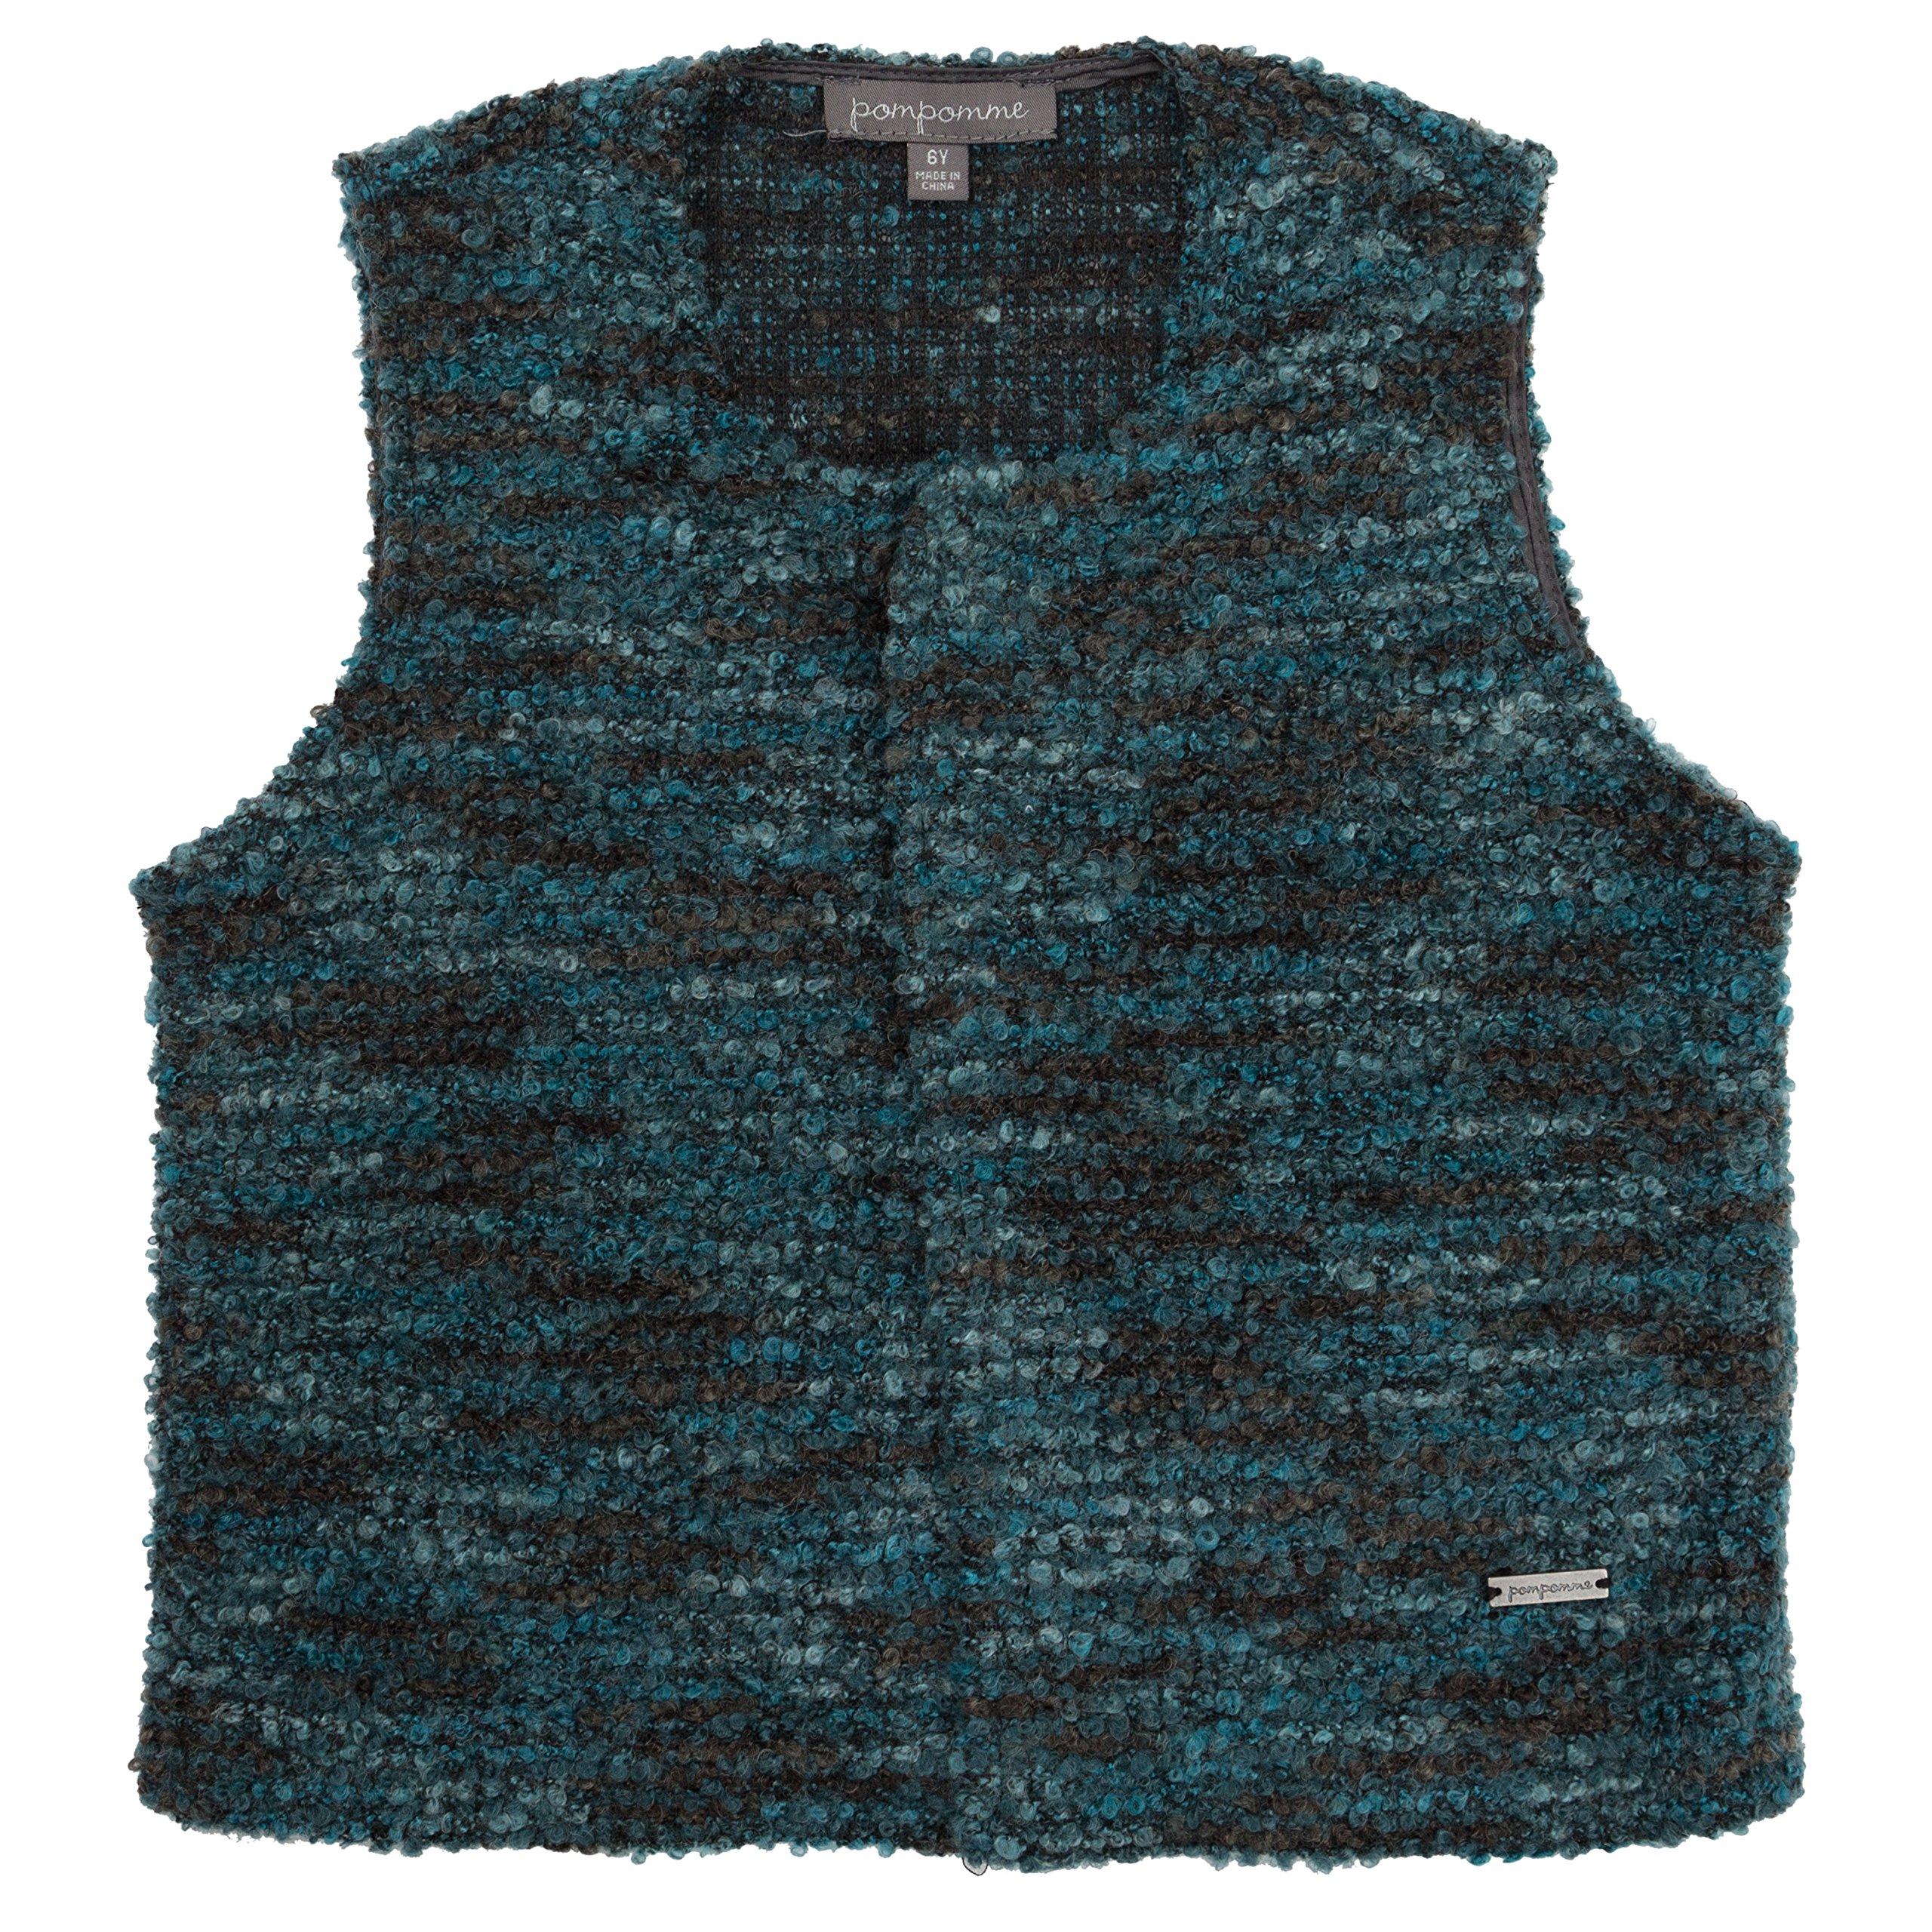 Pompomme Boy's Round Neck teal knit sweater vest w/snap closure (4 Yr)